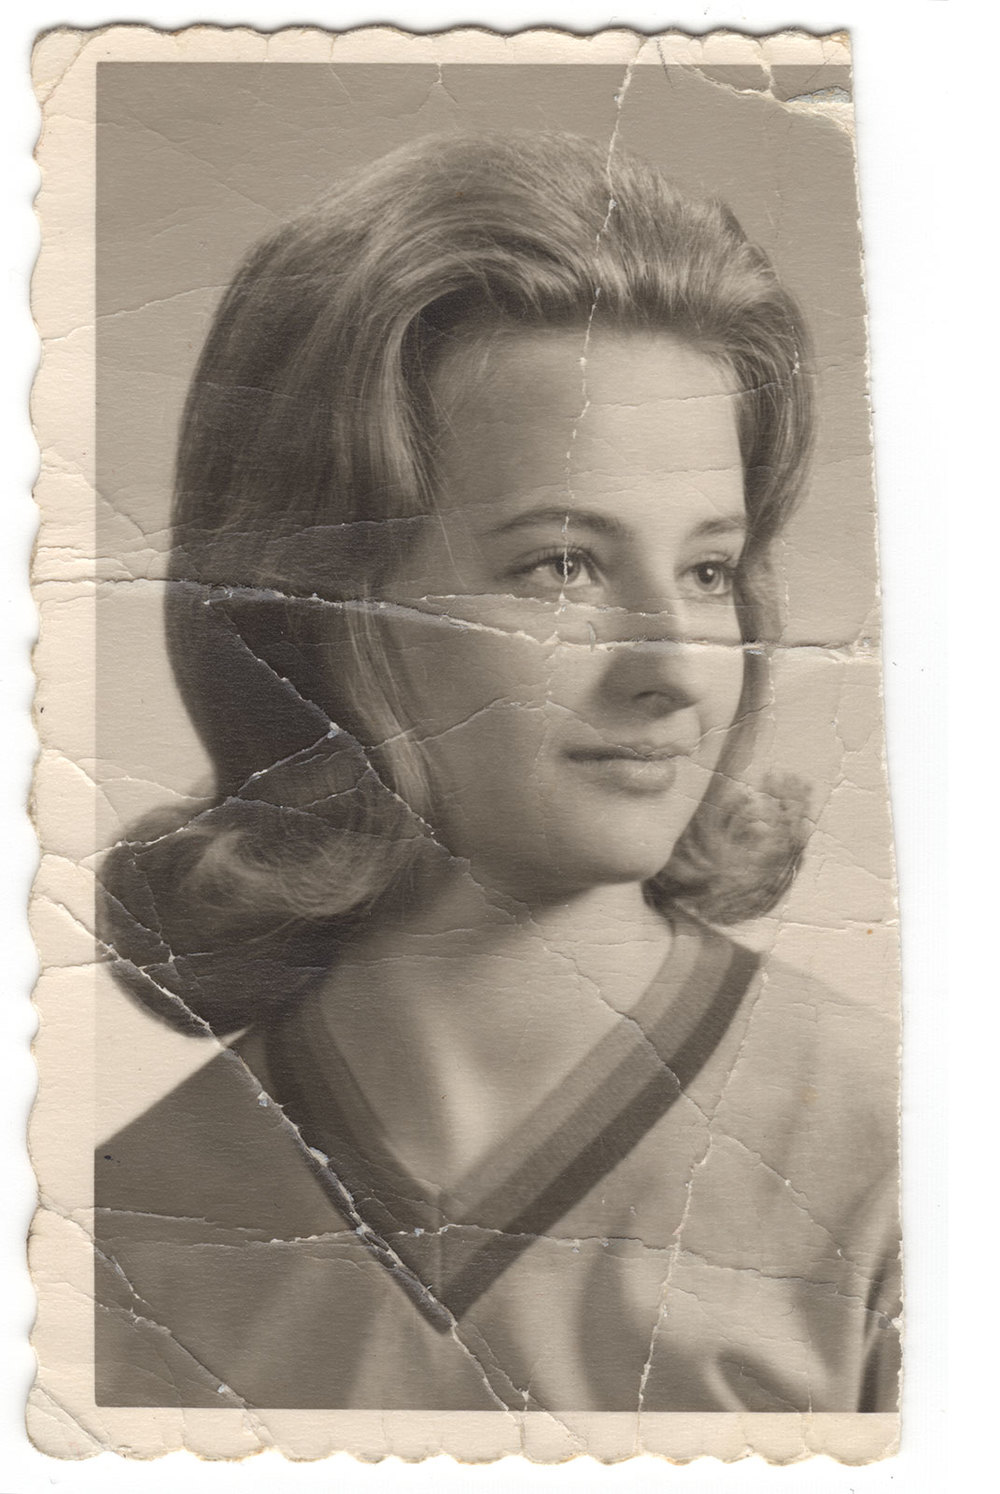 Joyce-senior-photo_orig.jpg